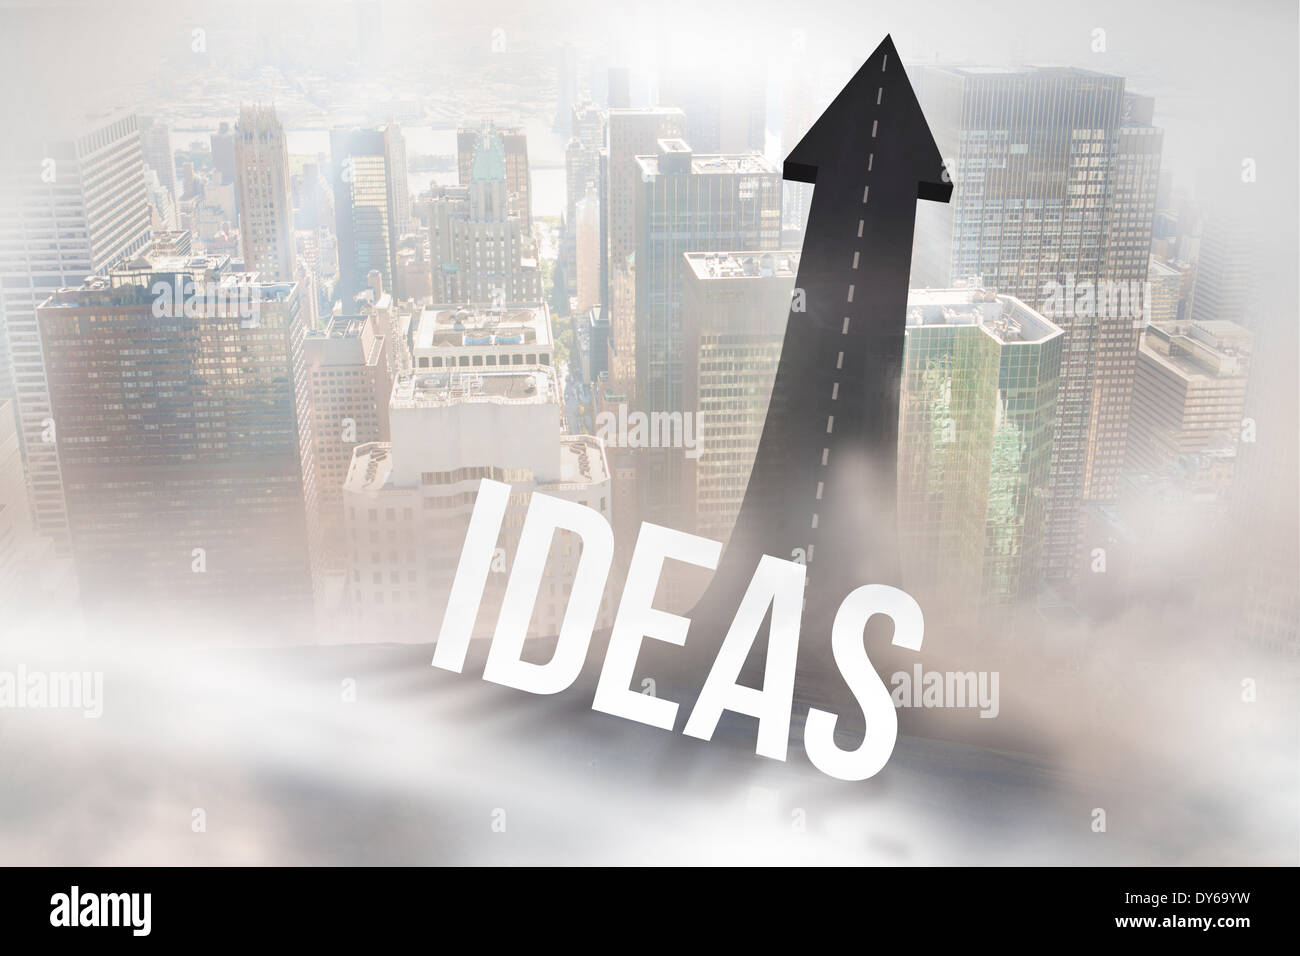 Ideen gegen Straße in Pfeil drehen Stockbild